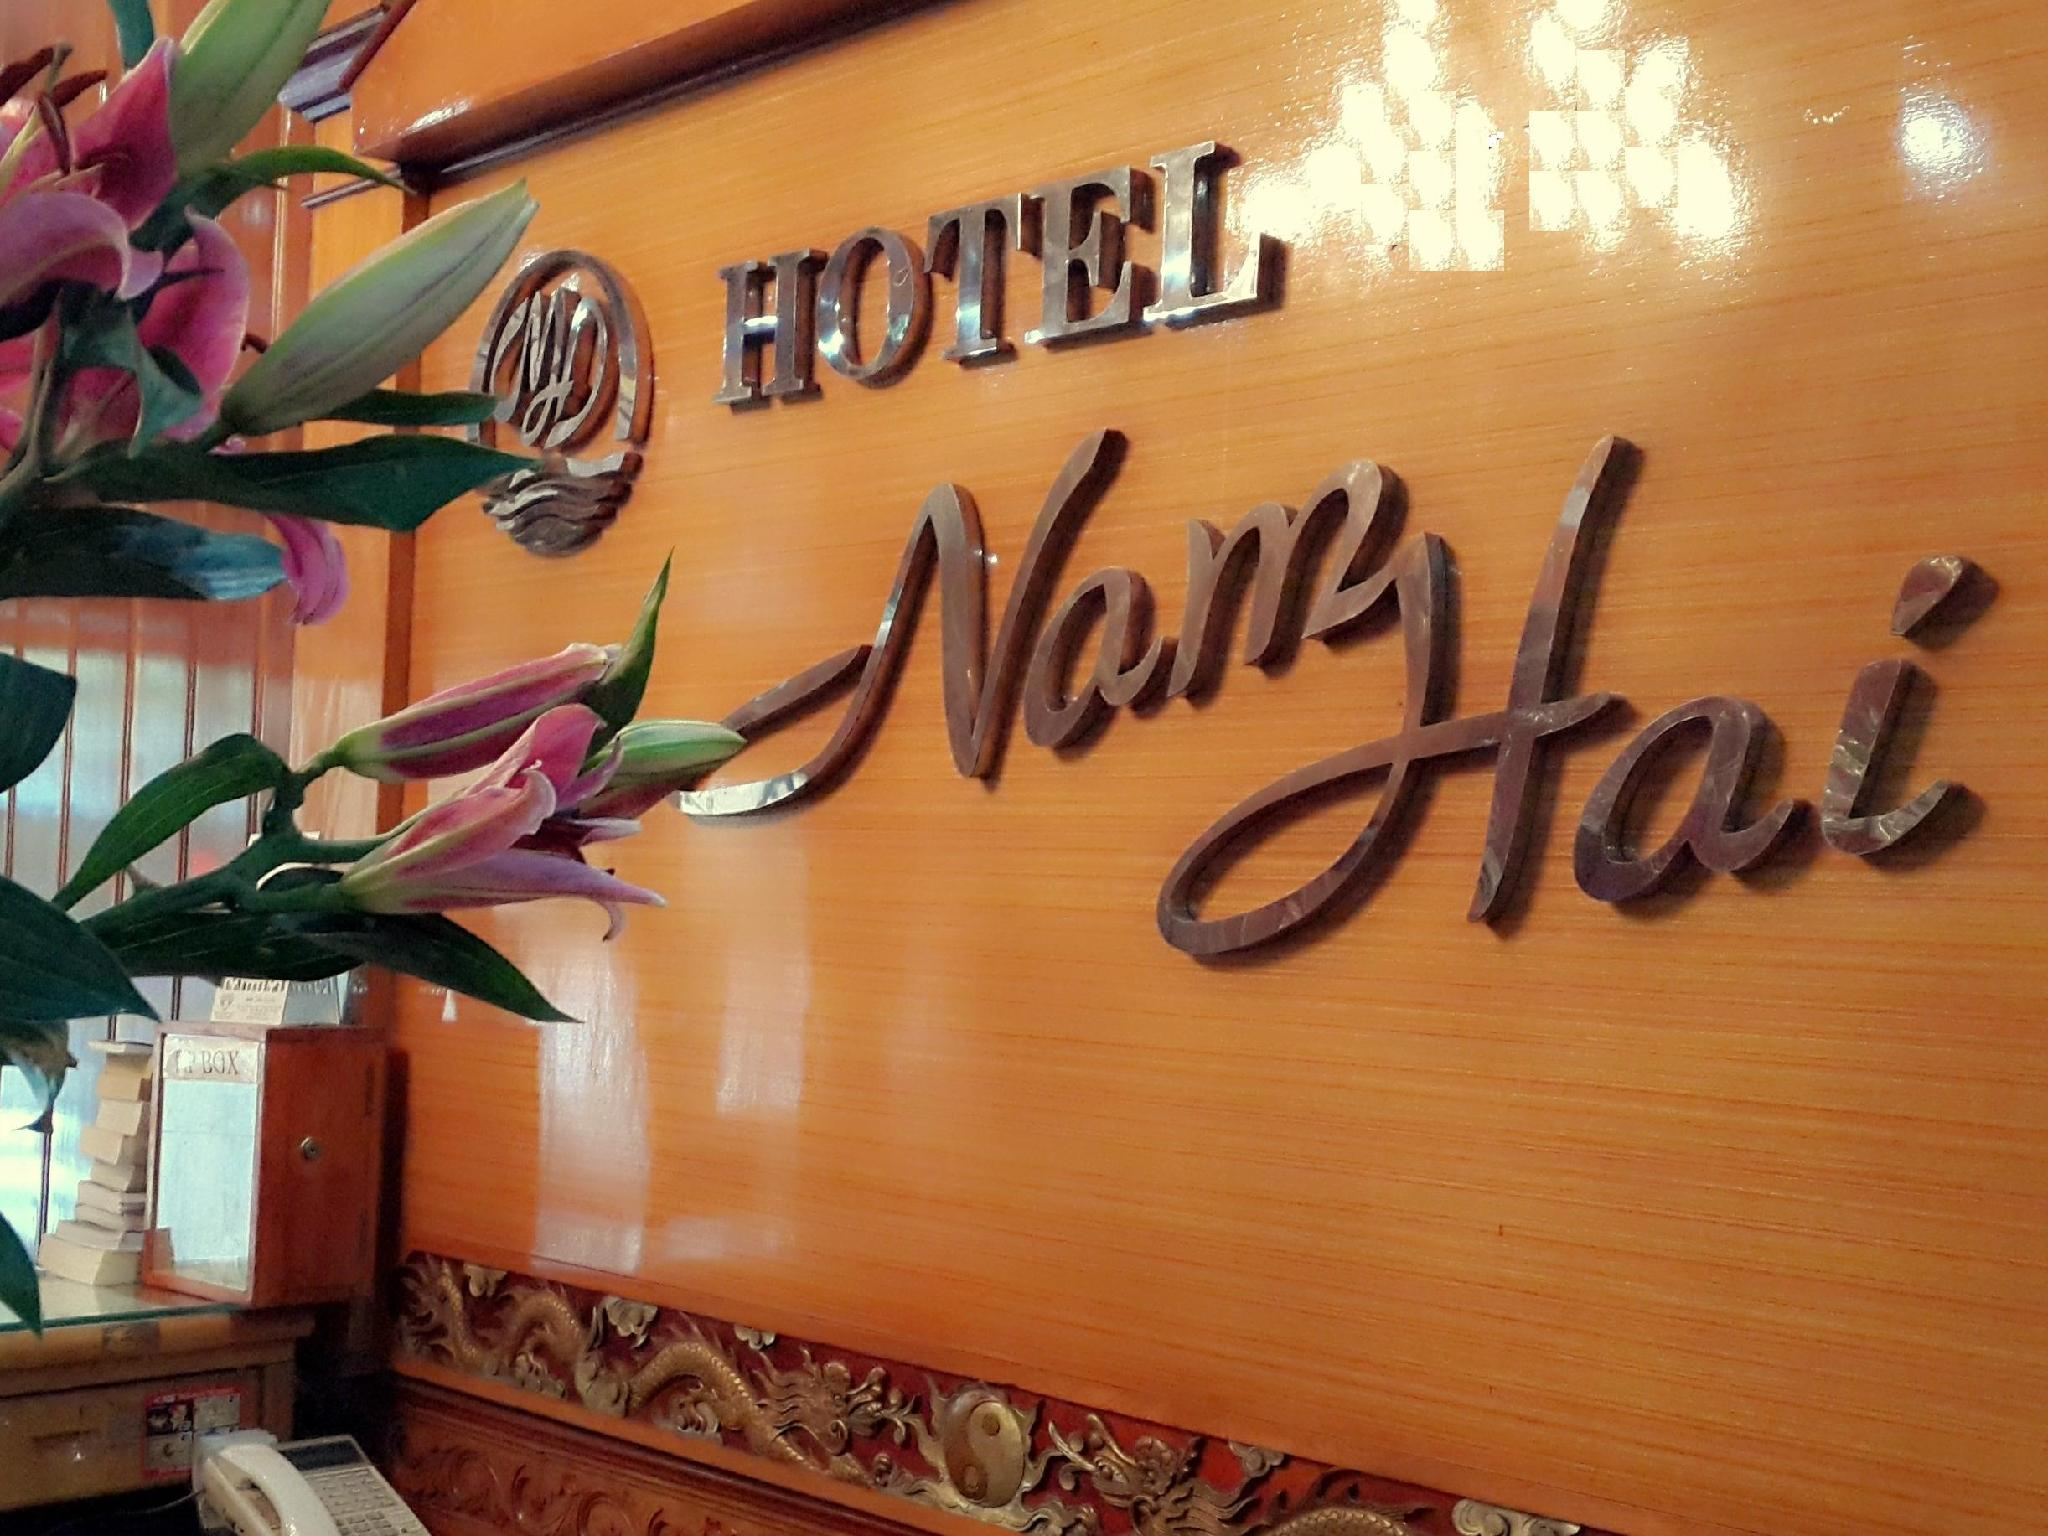 Hotell Nam Hai hotel